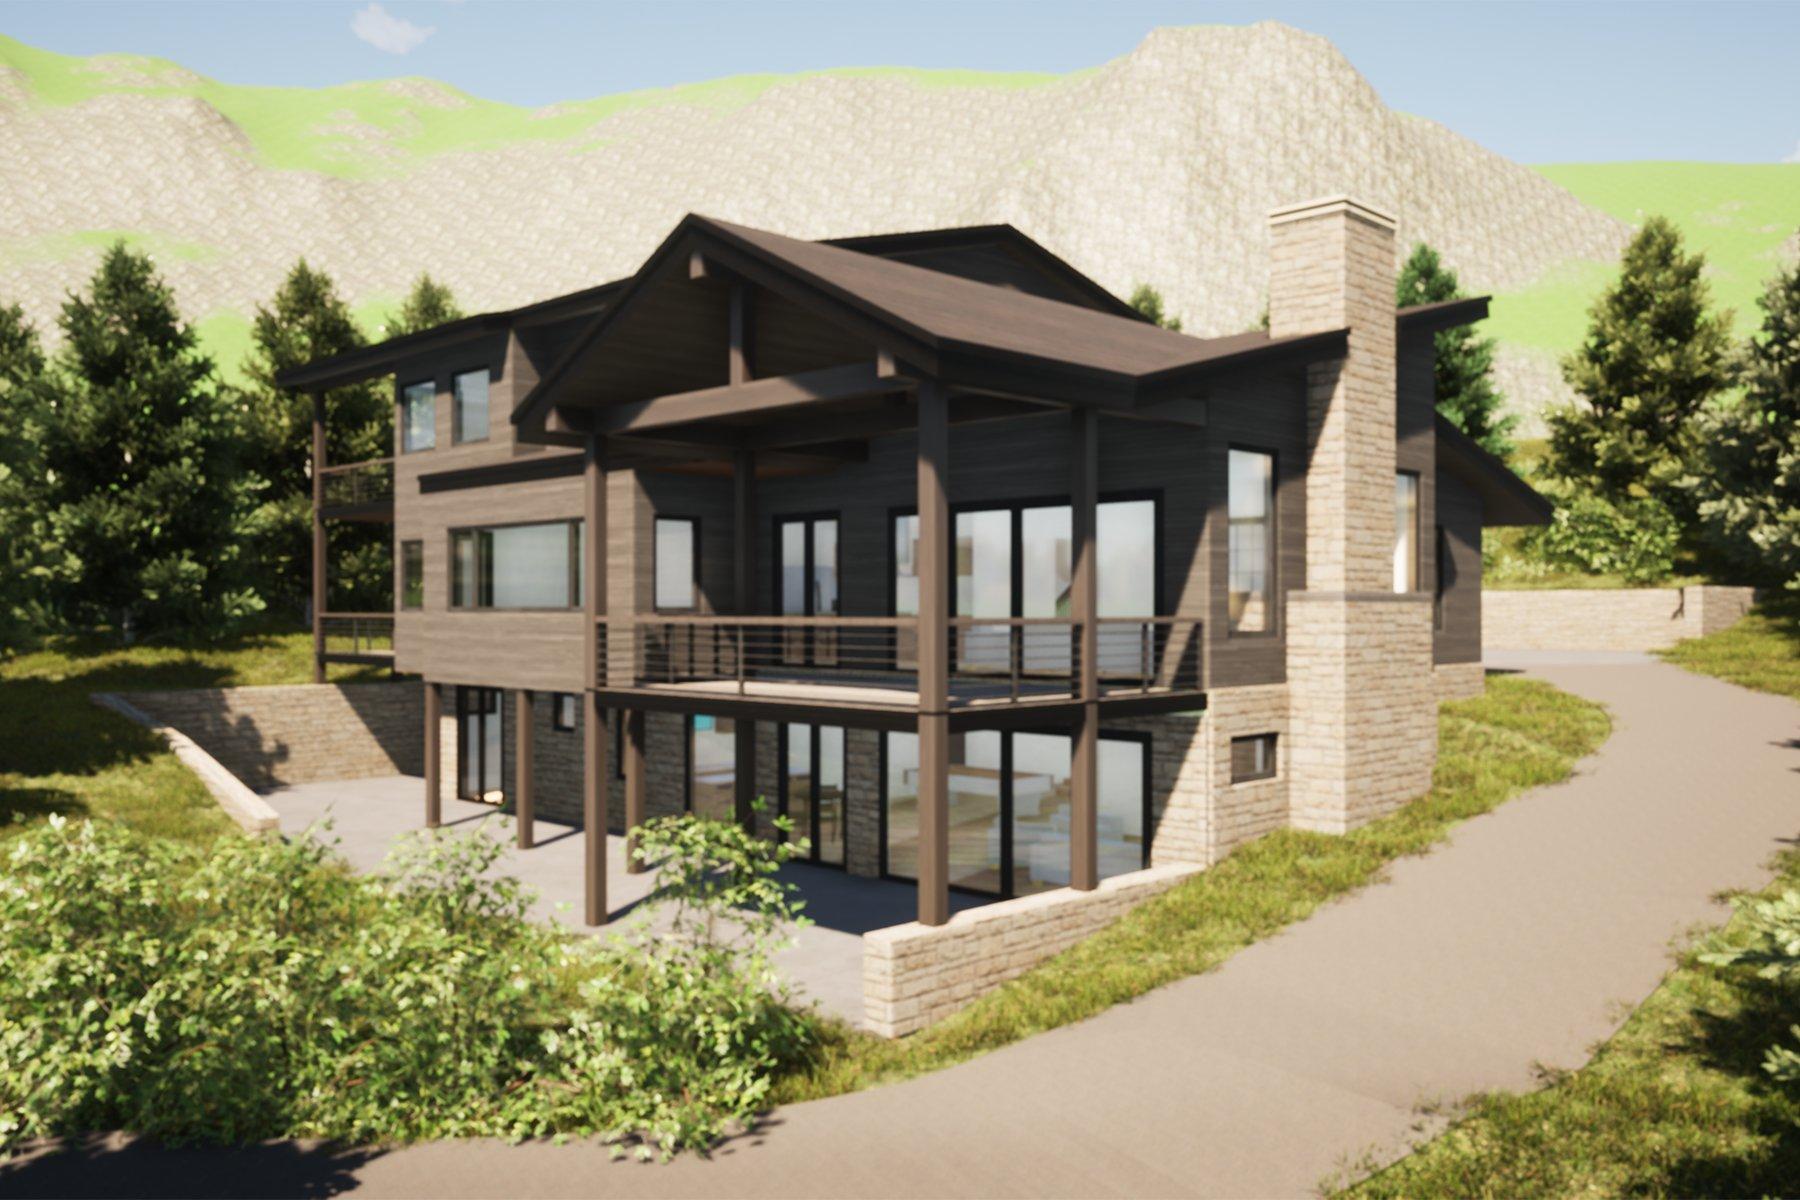 House in Teton Village, Wyoming, United States 1